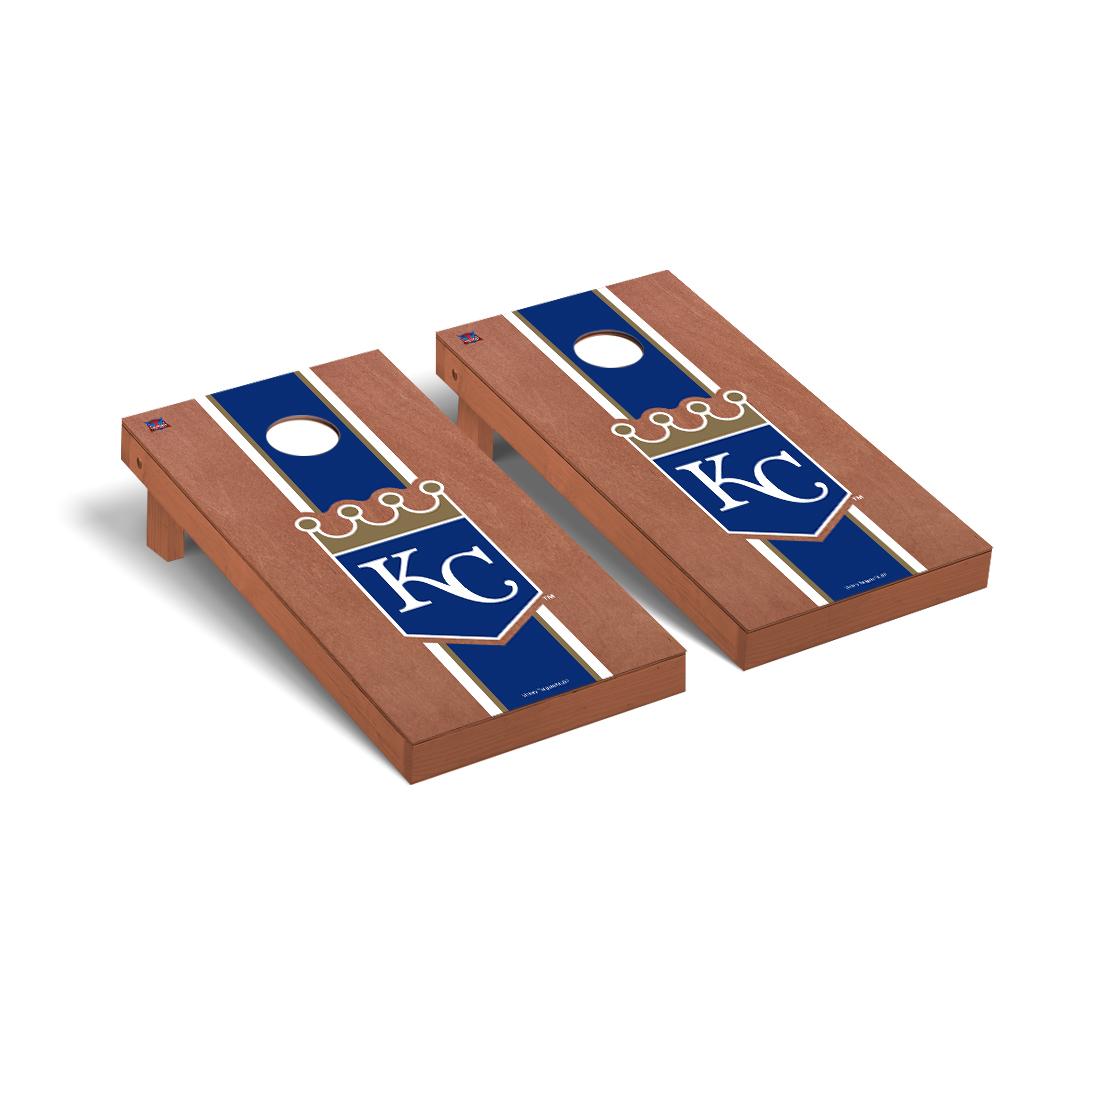 Kansas City Royals MLB Baseball Cornhole Game Set Rosewood Stained Stripe Version